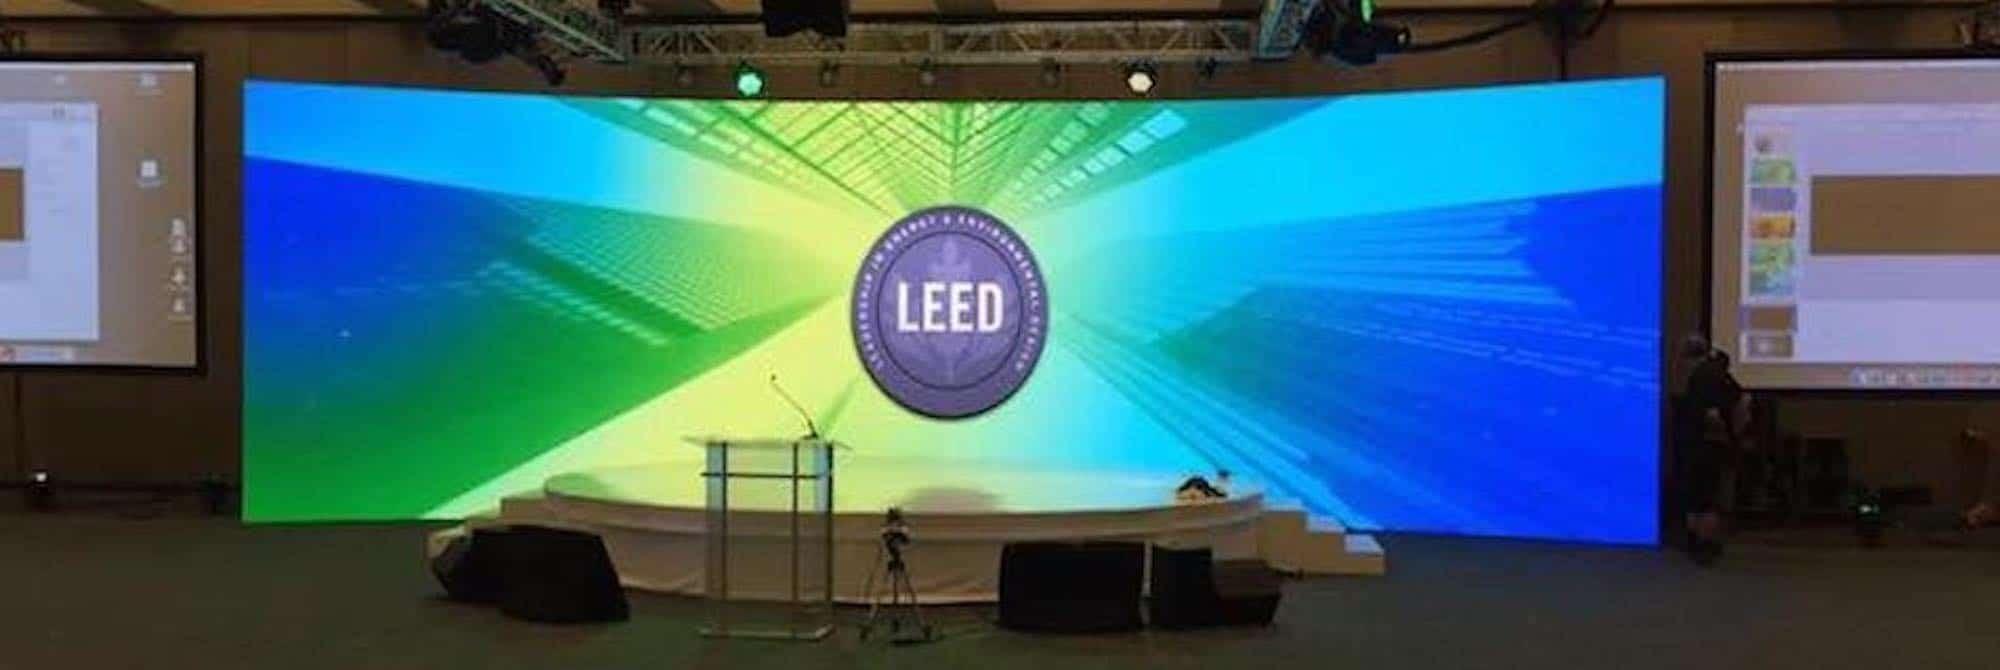 Audio and Video Equipment Rentals | LED Video Screen Rental